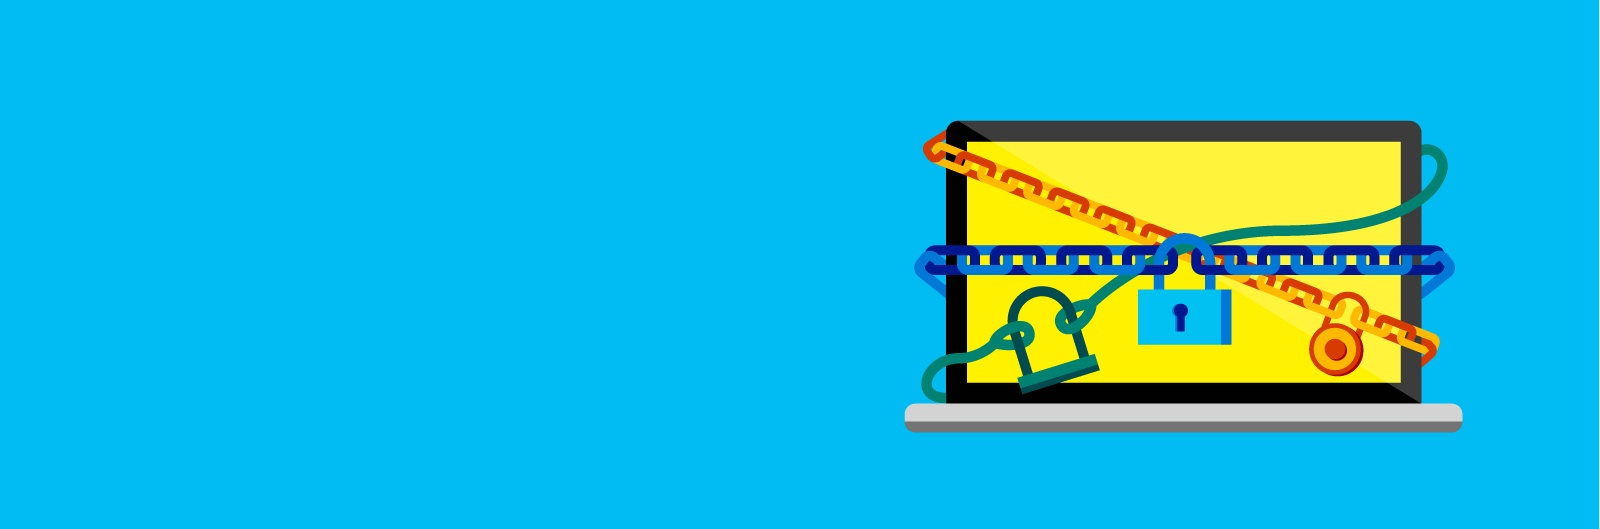 Social Engineering, Cyber Security, Security, Windows Defender